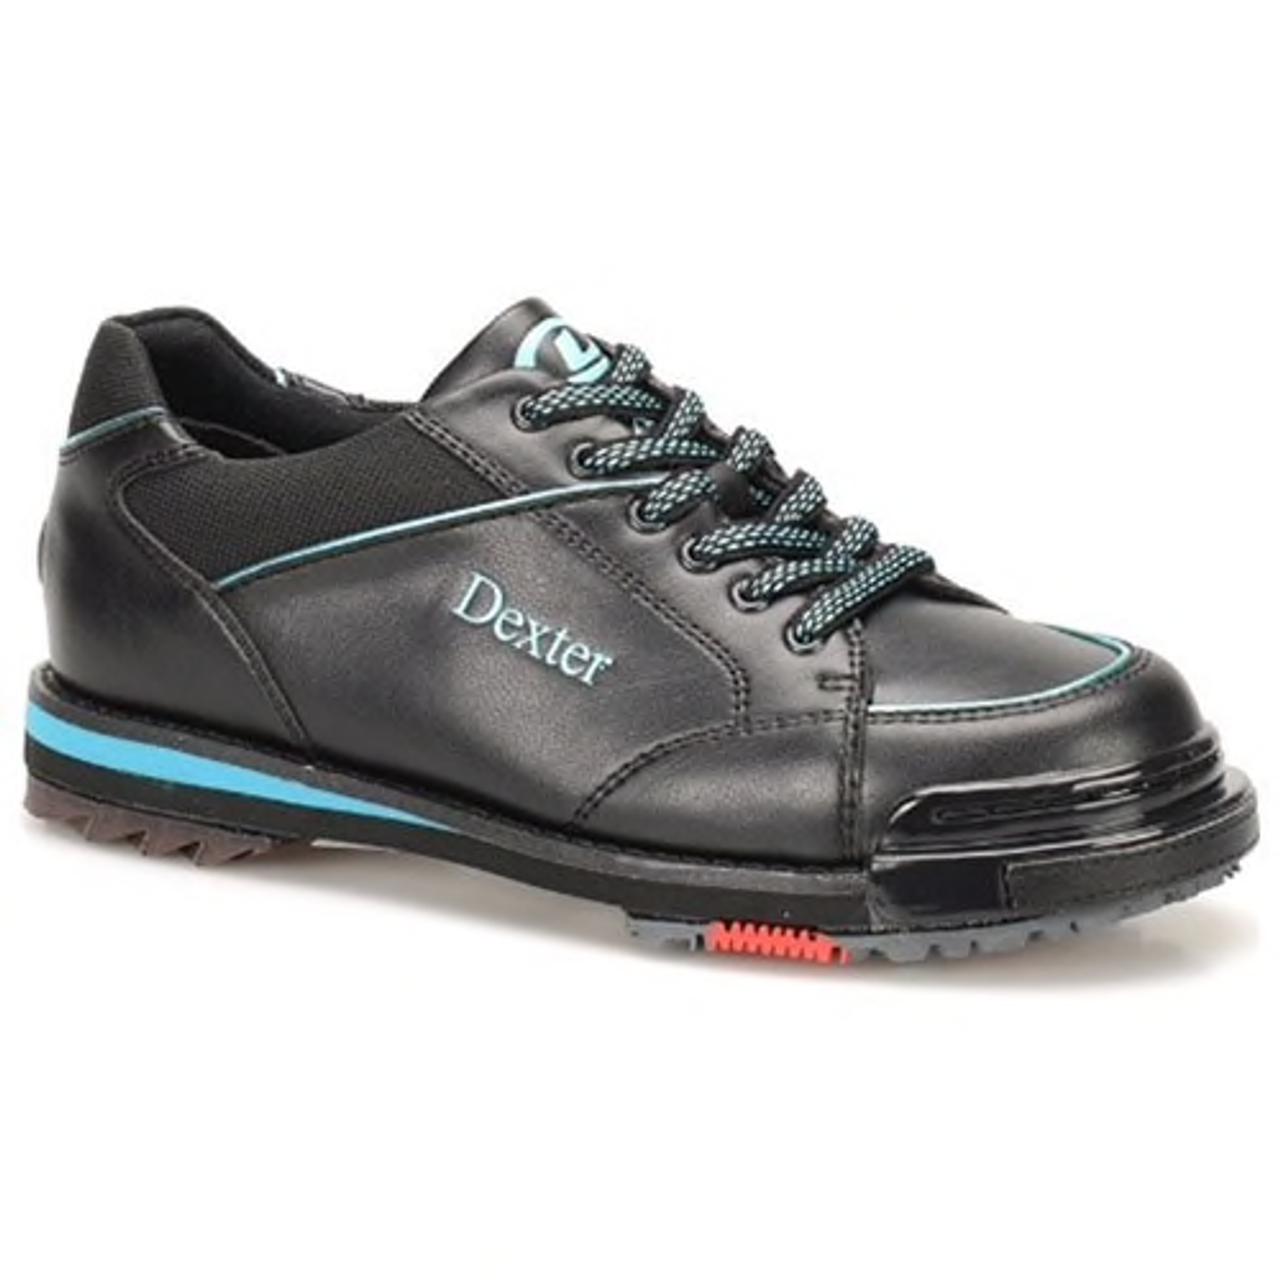 Dexter SST 8 Pro Womens Bowling Shoes Black/Turquoise